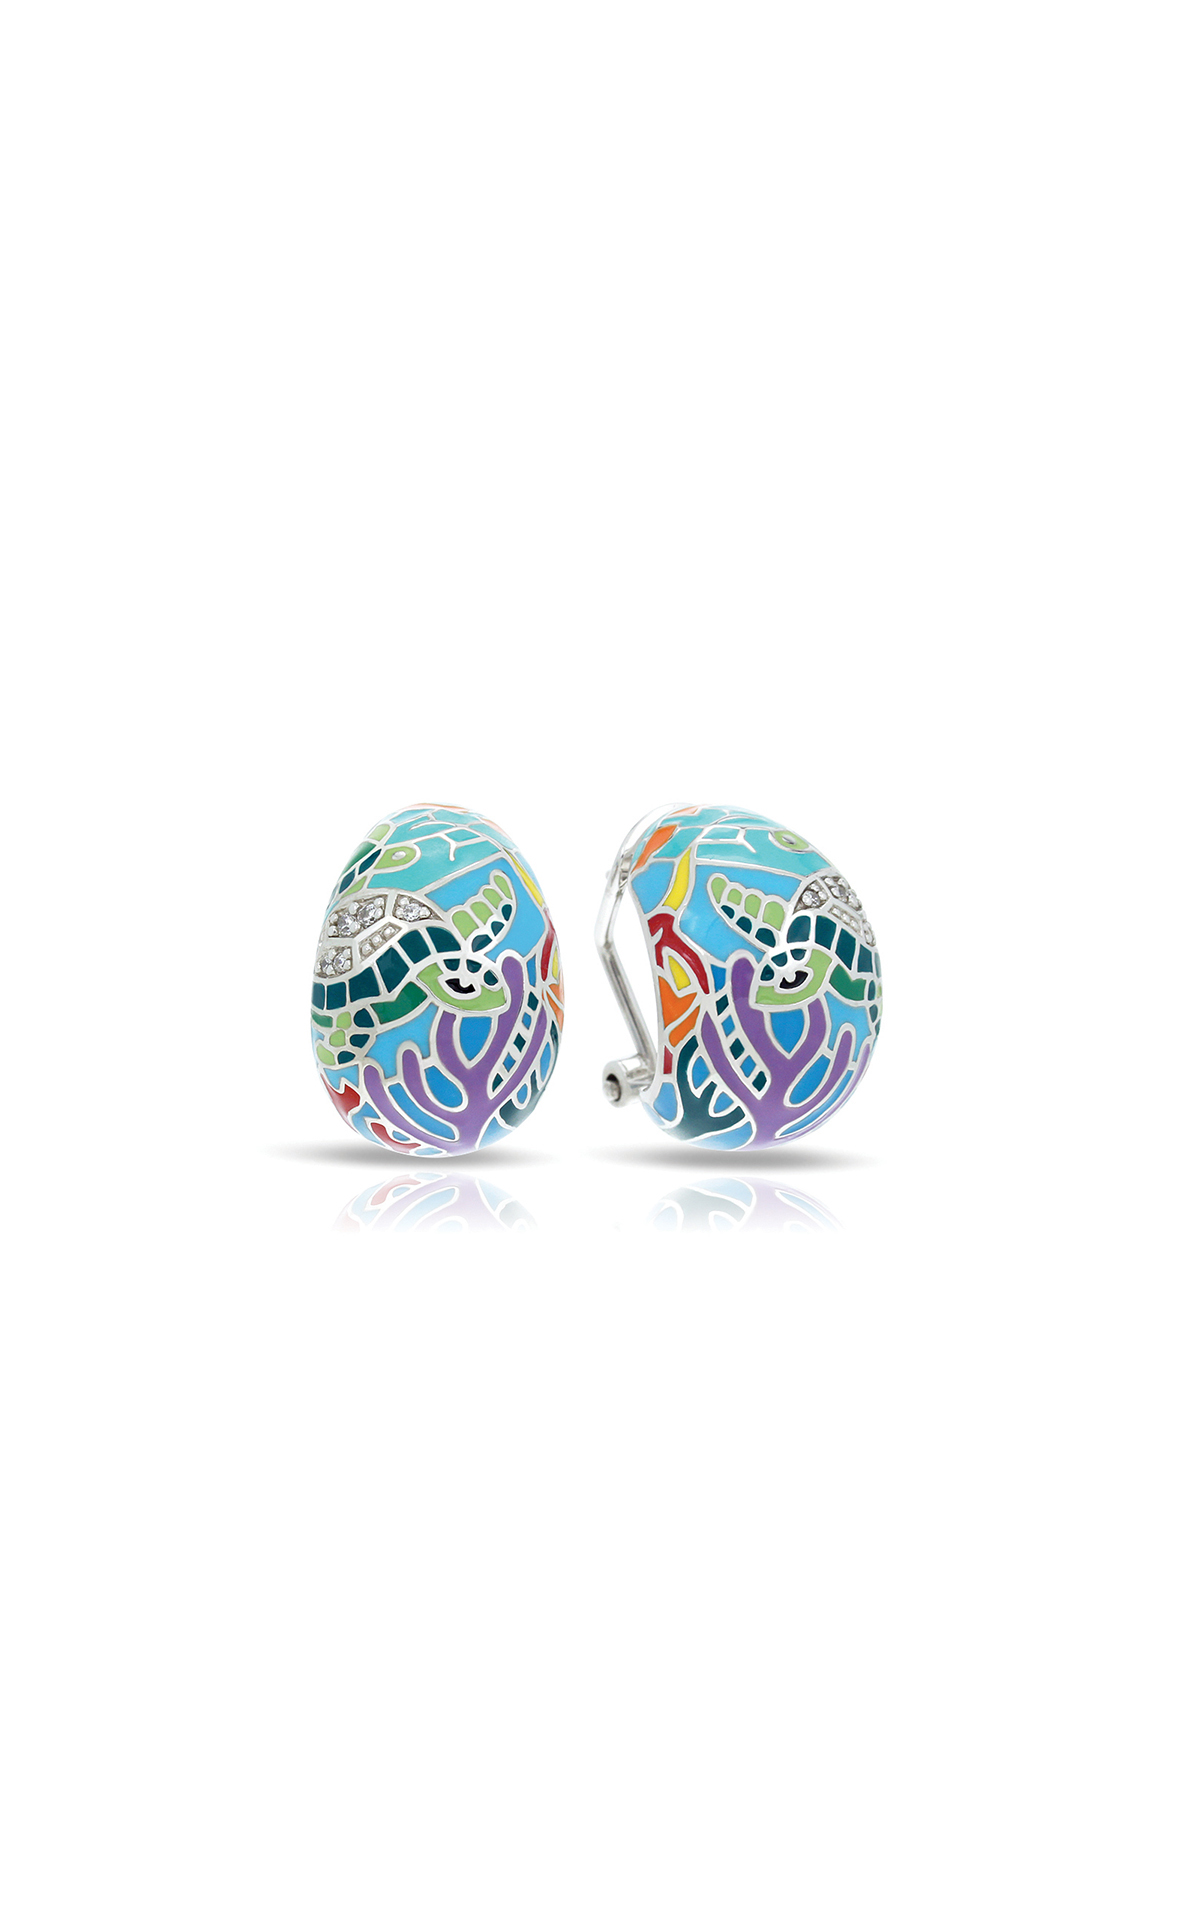 Belle Etoile Sea Turtle Aqua Earrings 3021610501 product image